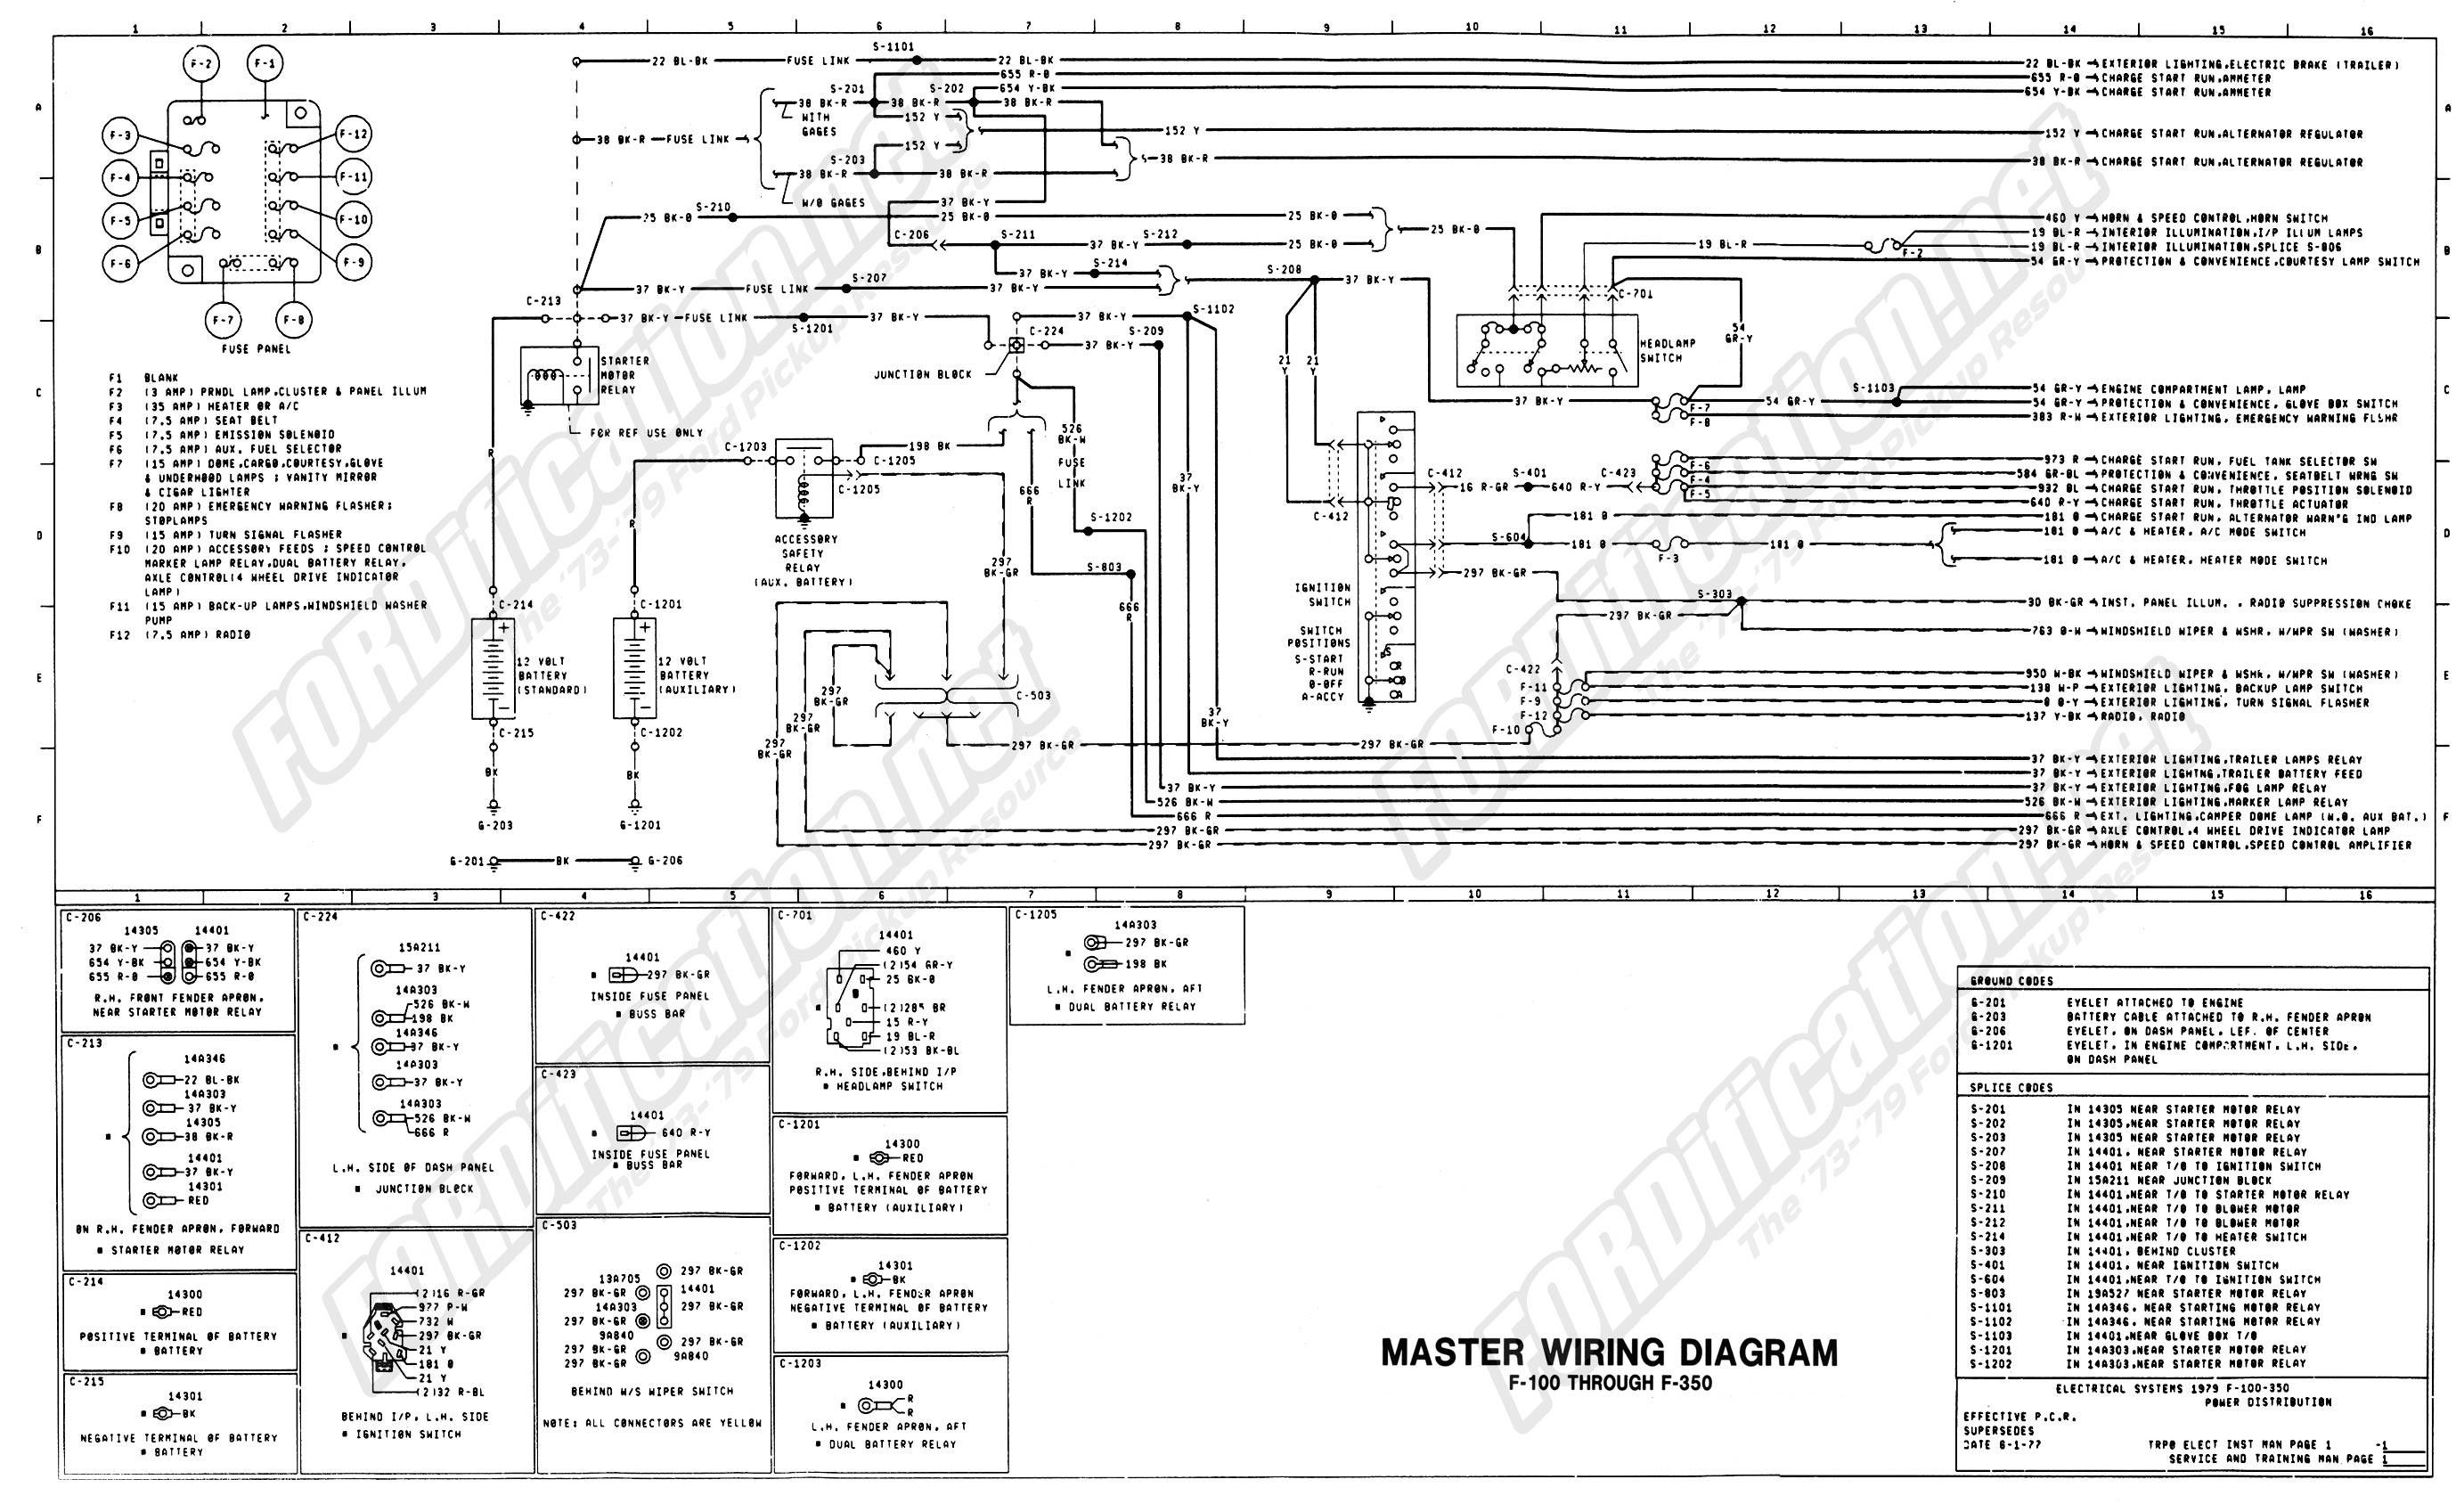 2004 Ford Ranger Wiring Diagram My Wiring Diagram